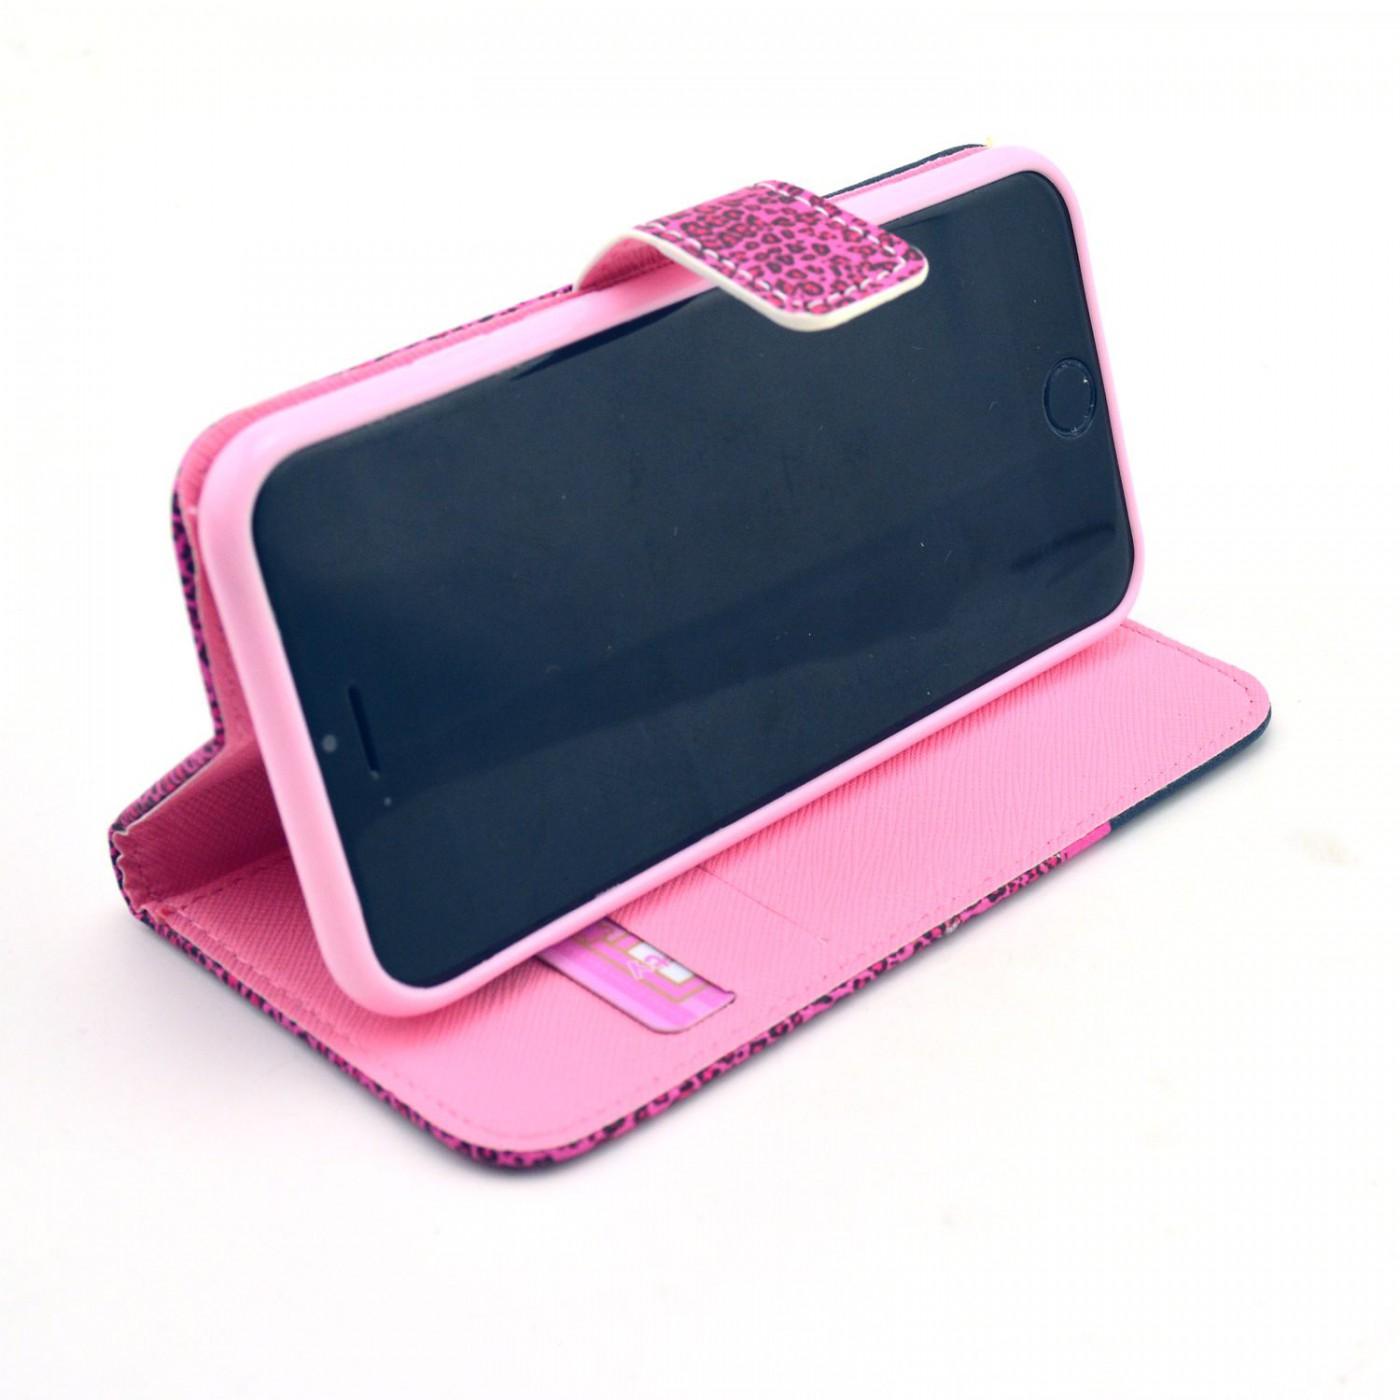 iphone 6 cadeau